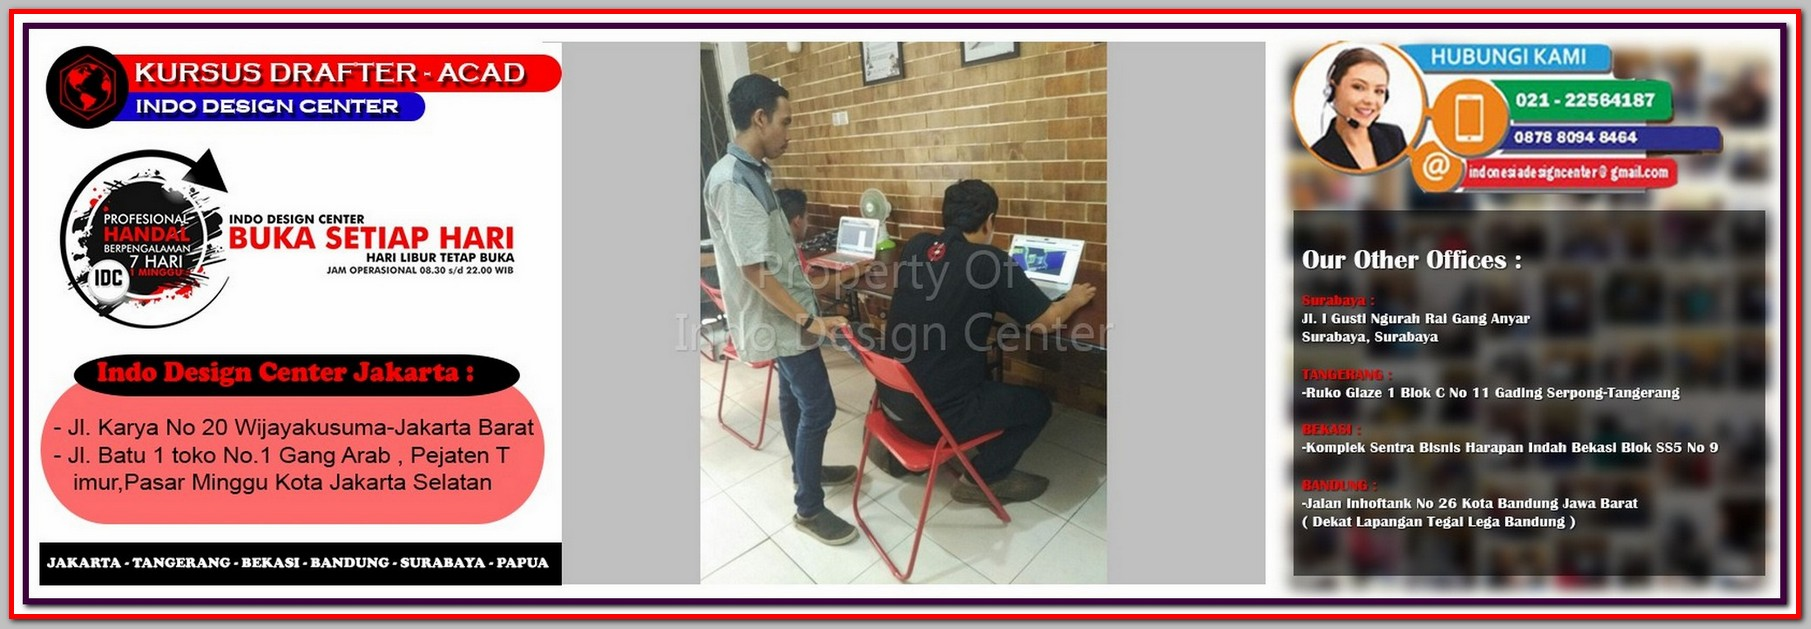 Kursus SAP 2000 Di Mangga Dua Selatan - Jakarta - Tangerang - Bekasi - Bandung - Surabaya